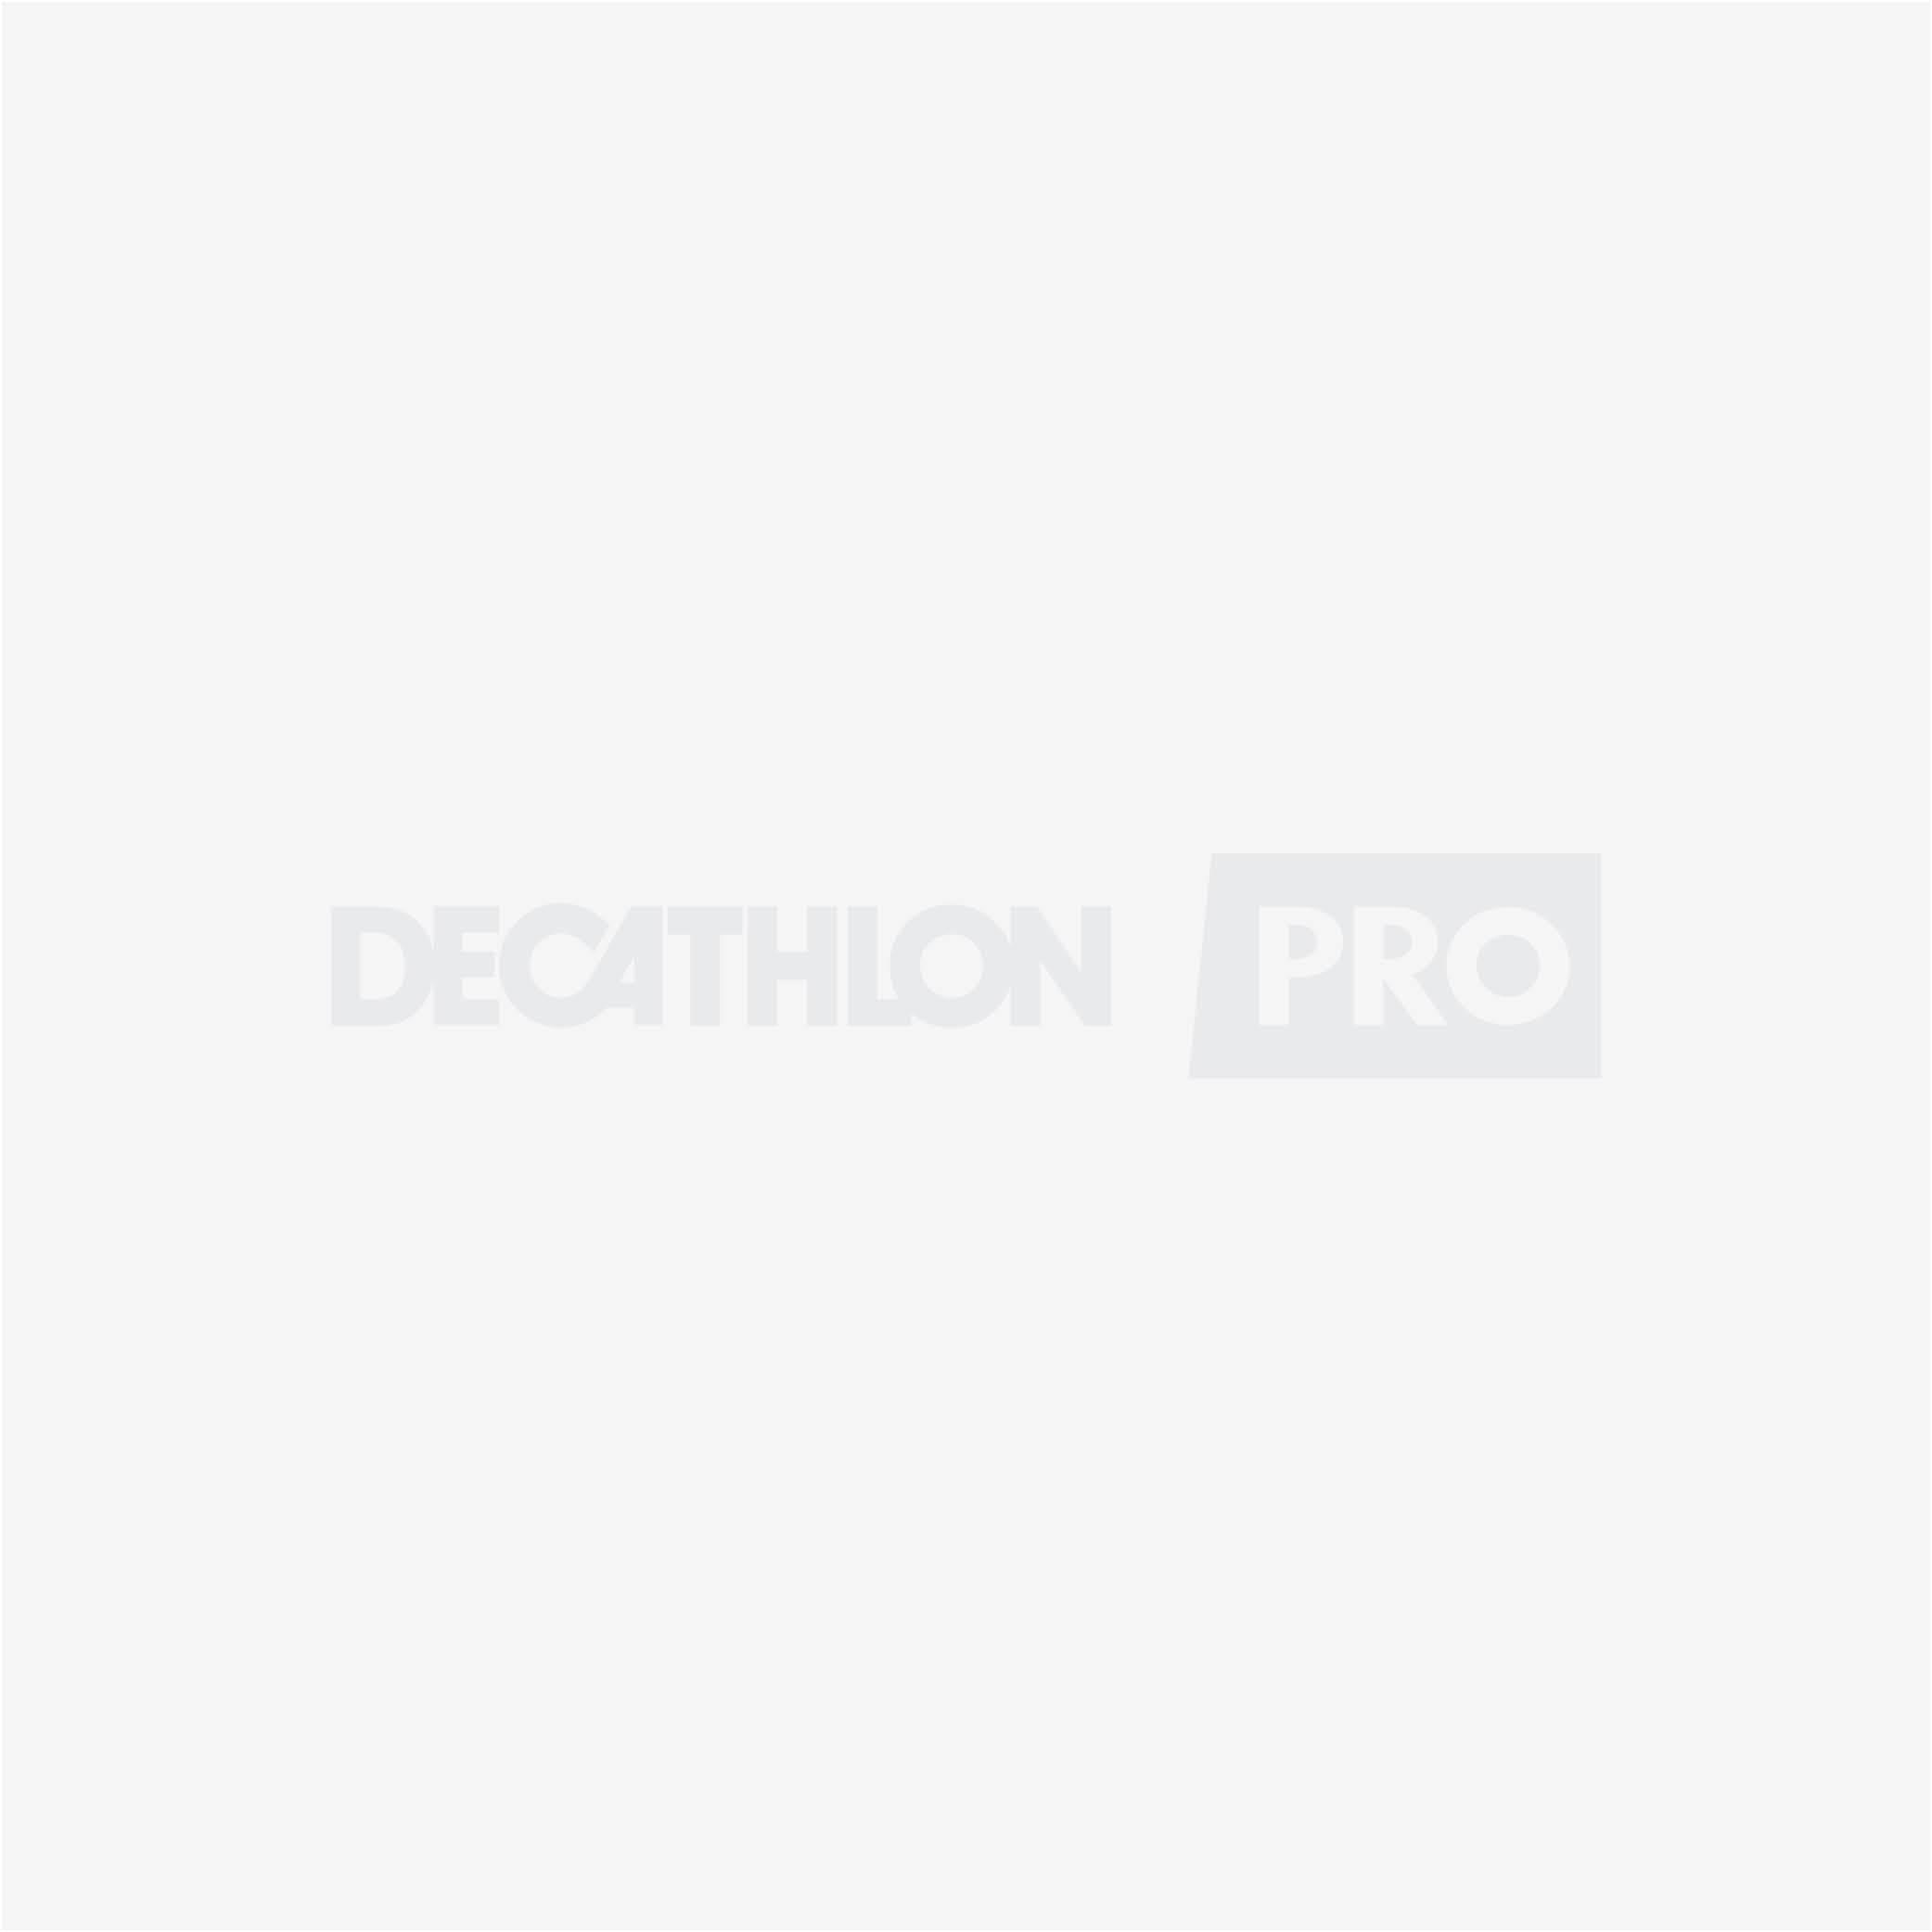 S14_BAN_MENU_OOTDOOR.jpg